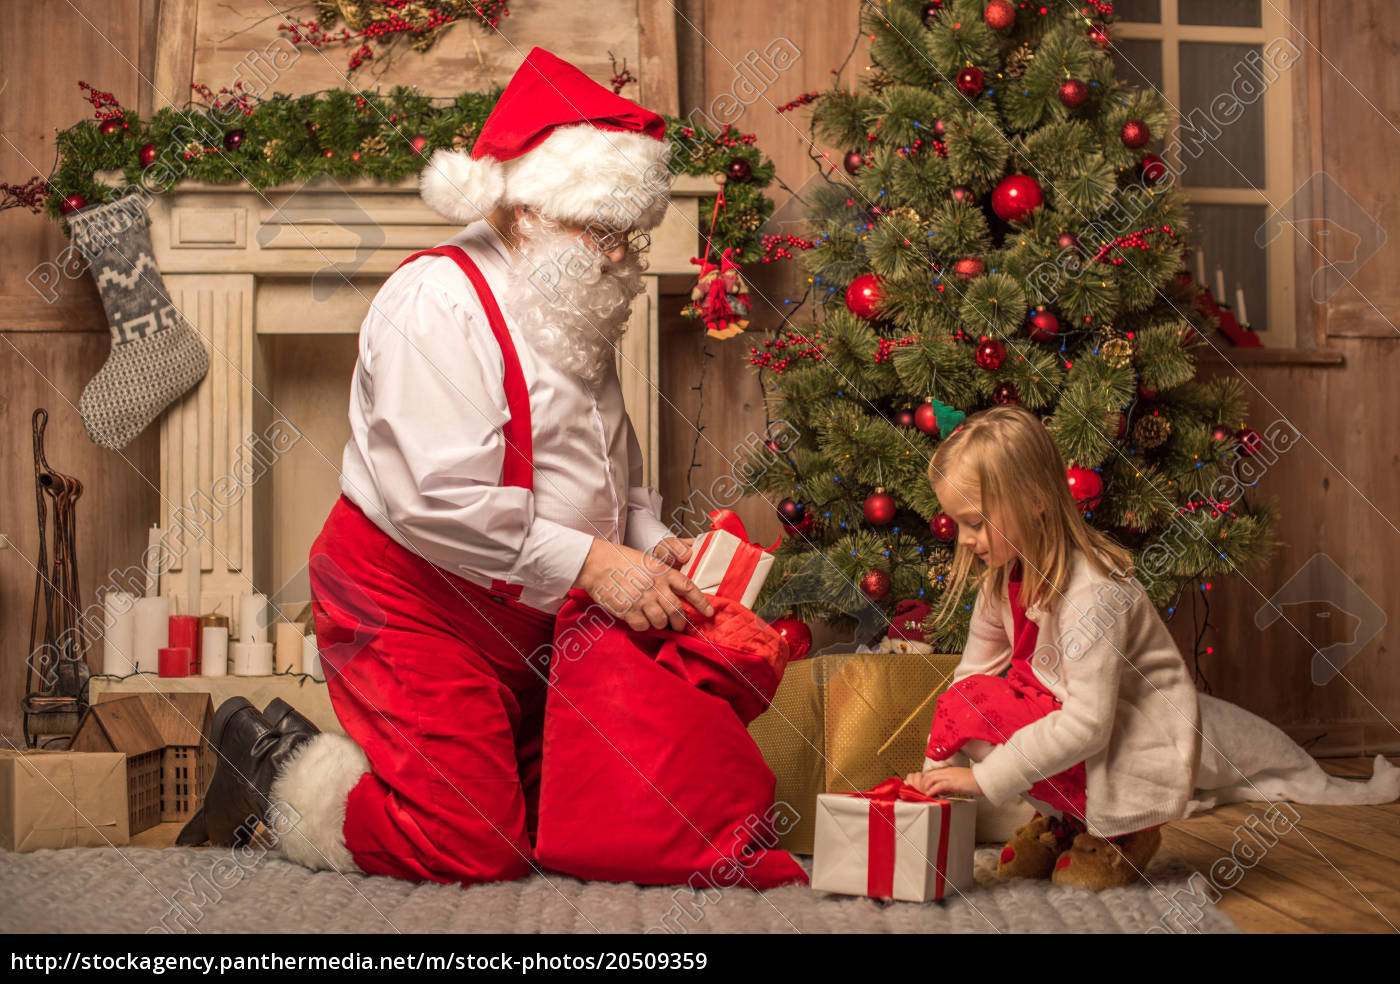 santa, claus, showing, christmas, presents - 20509359